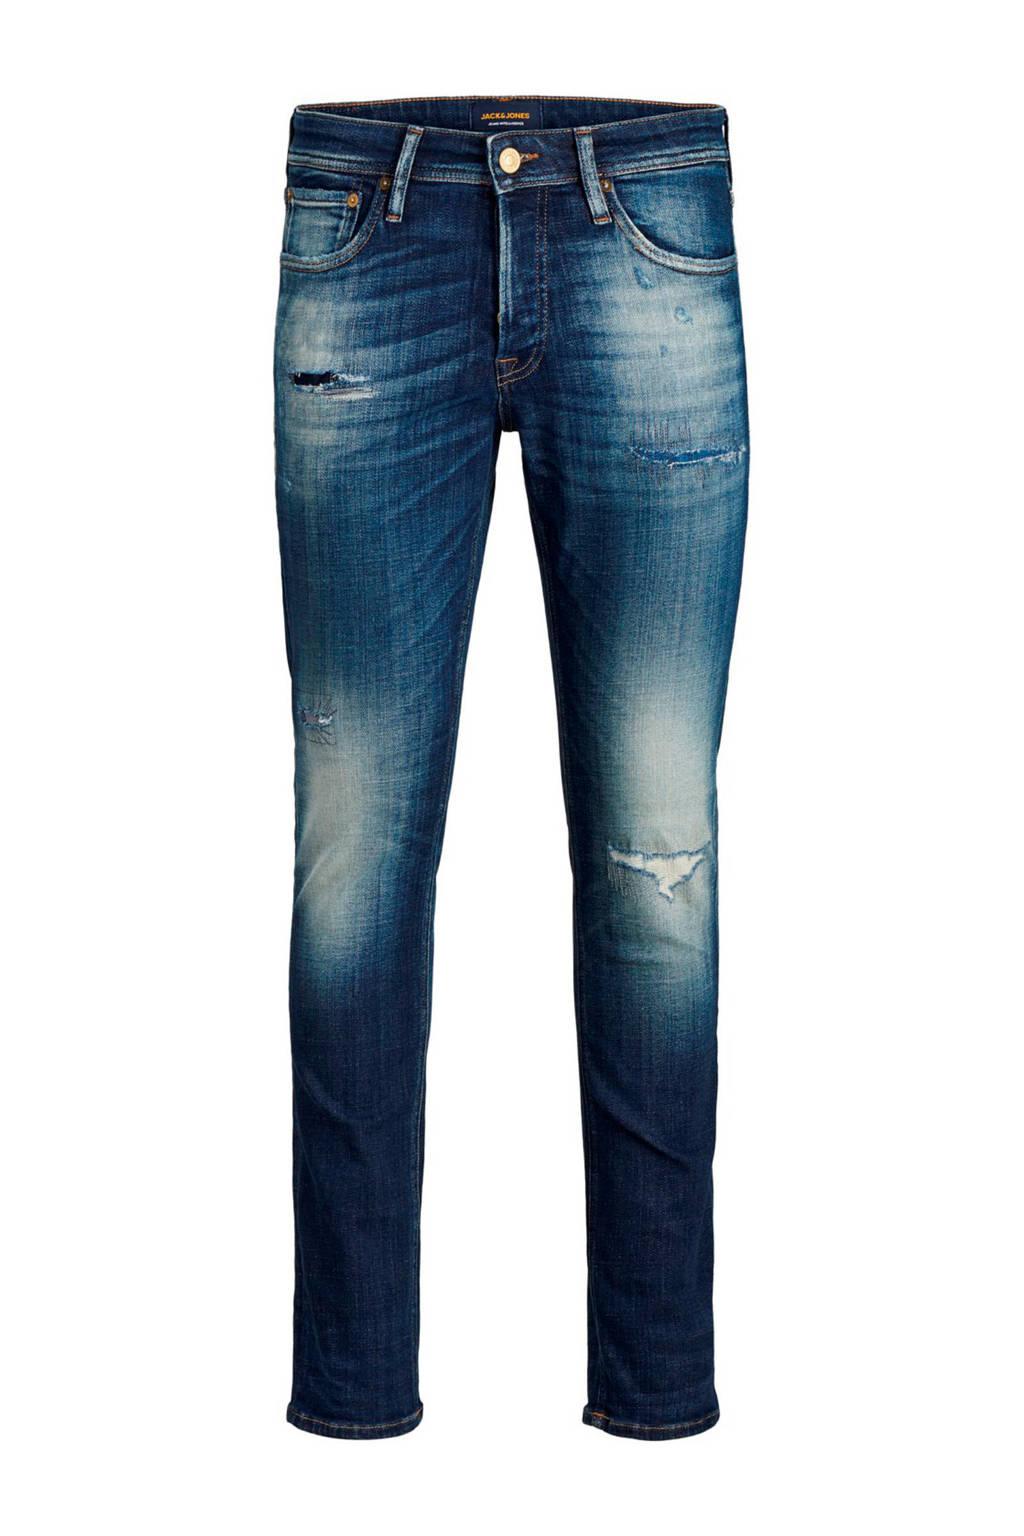 JACK & JONES JEANS INTELLIGENCE slim fit jeans Glenn met slijtage blue denim 164, Blue Denim 164